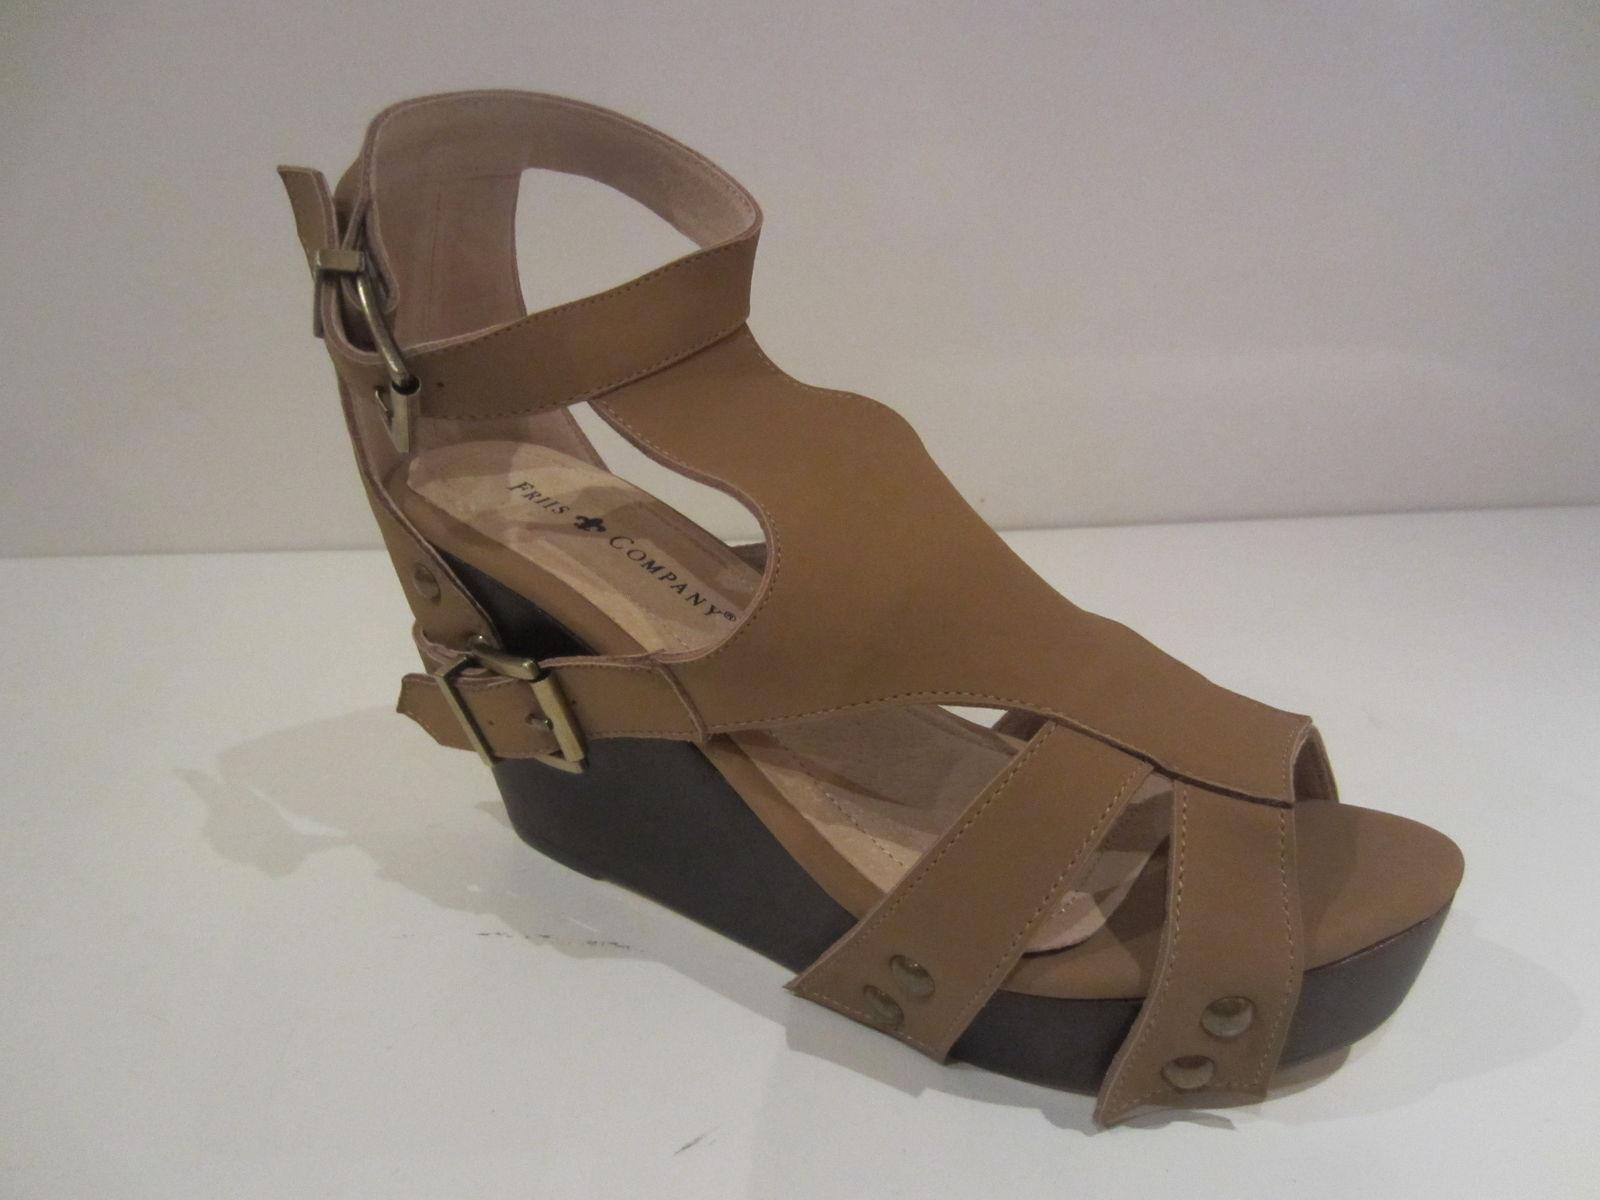 Friis & Company Tessie  señora cuero fashion-sandalias marrón nuevo & OVP